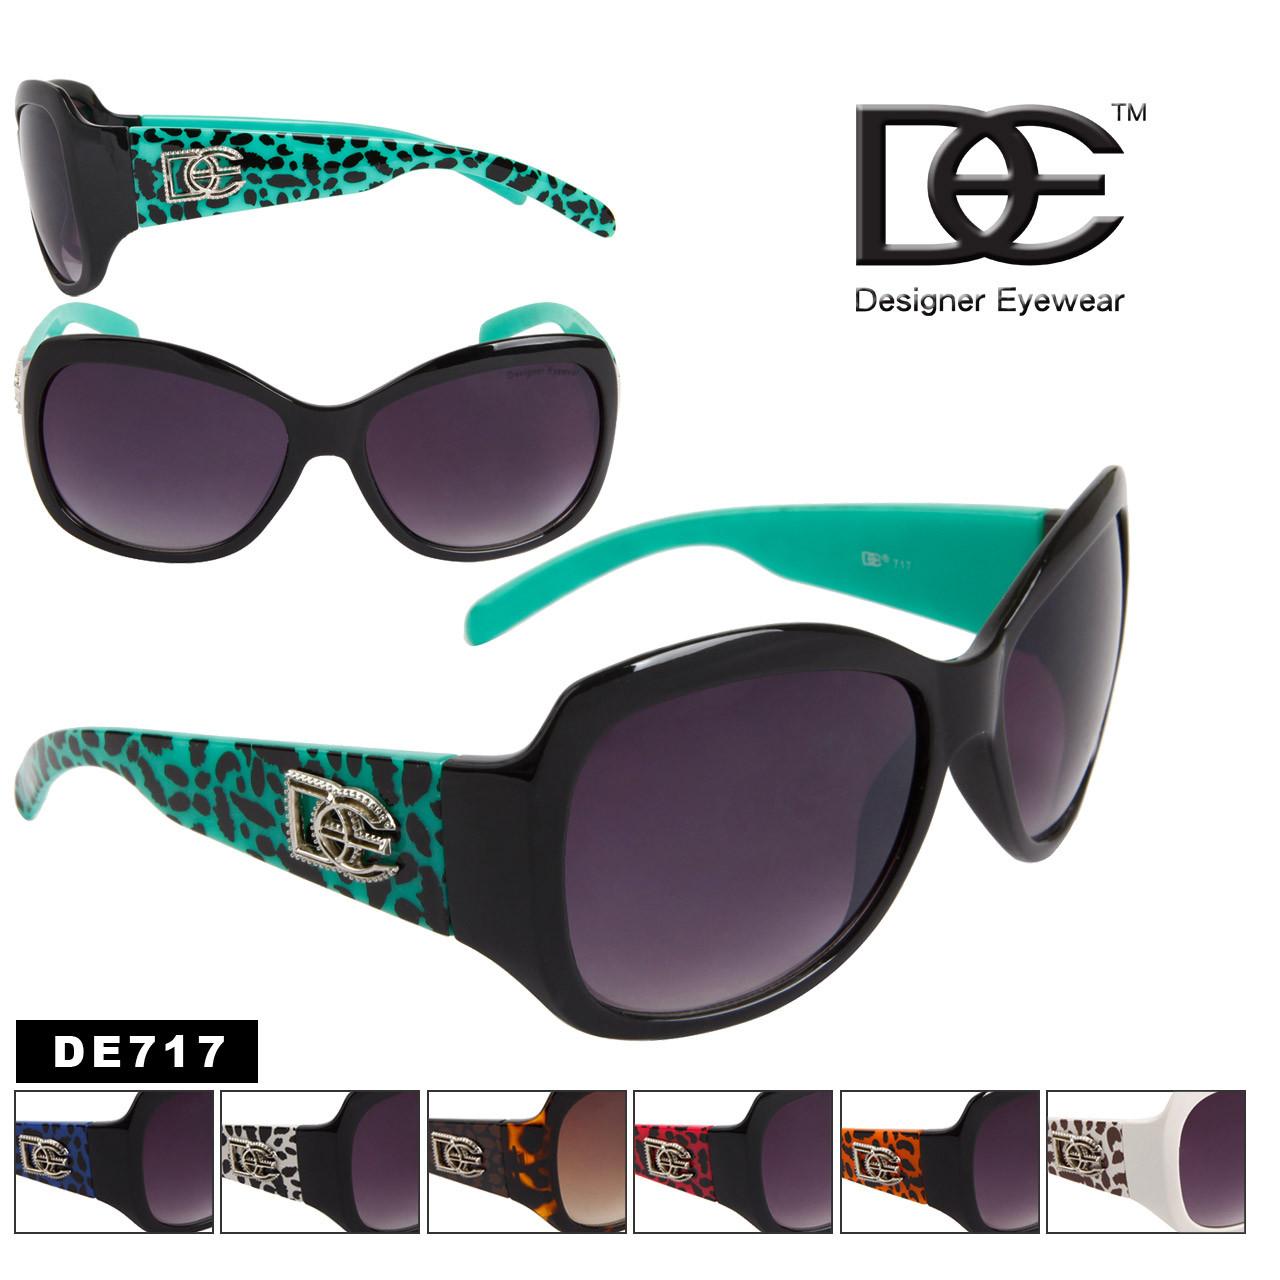 Designer Eyewear™ Fashion Sunglasses by the Dozen - Style # DE717